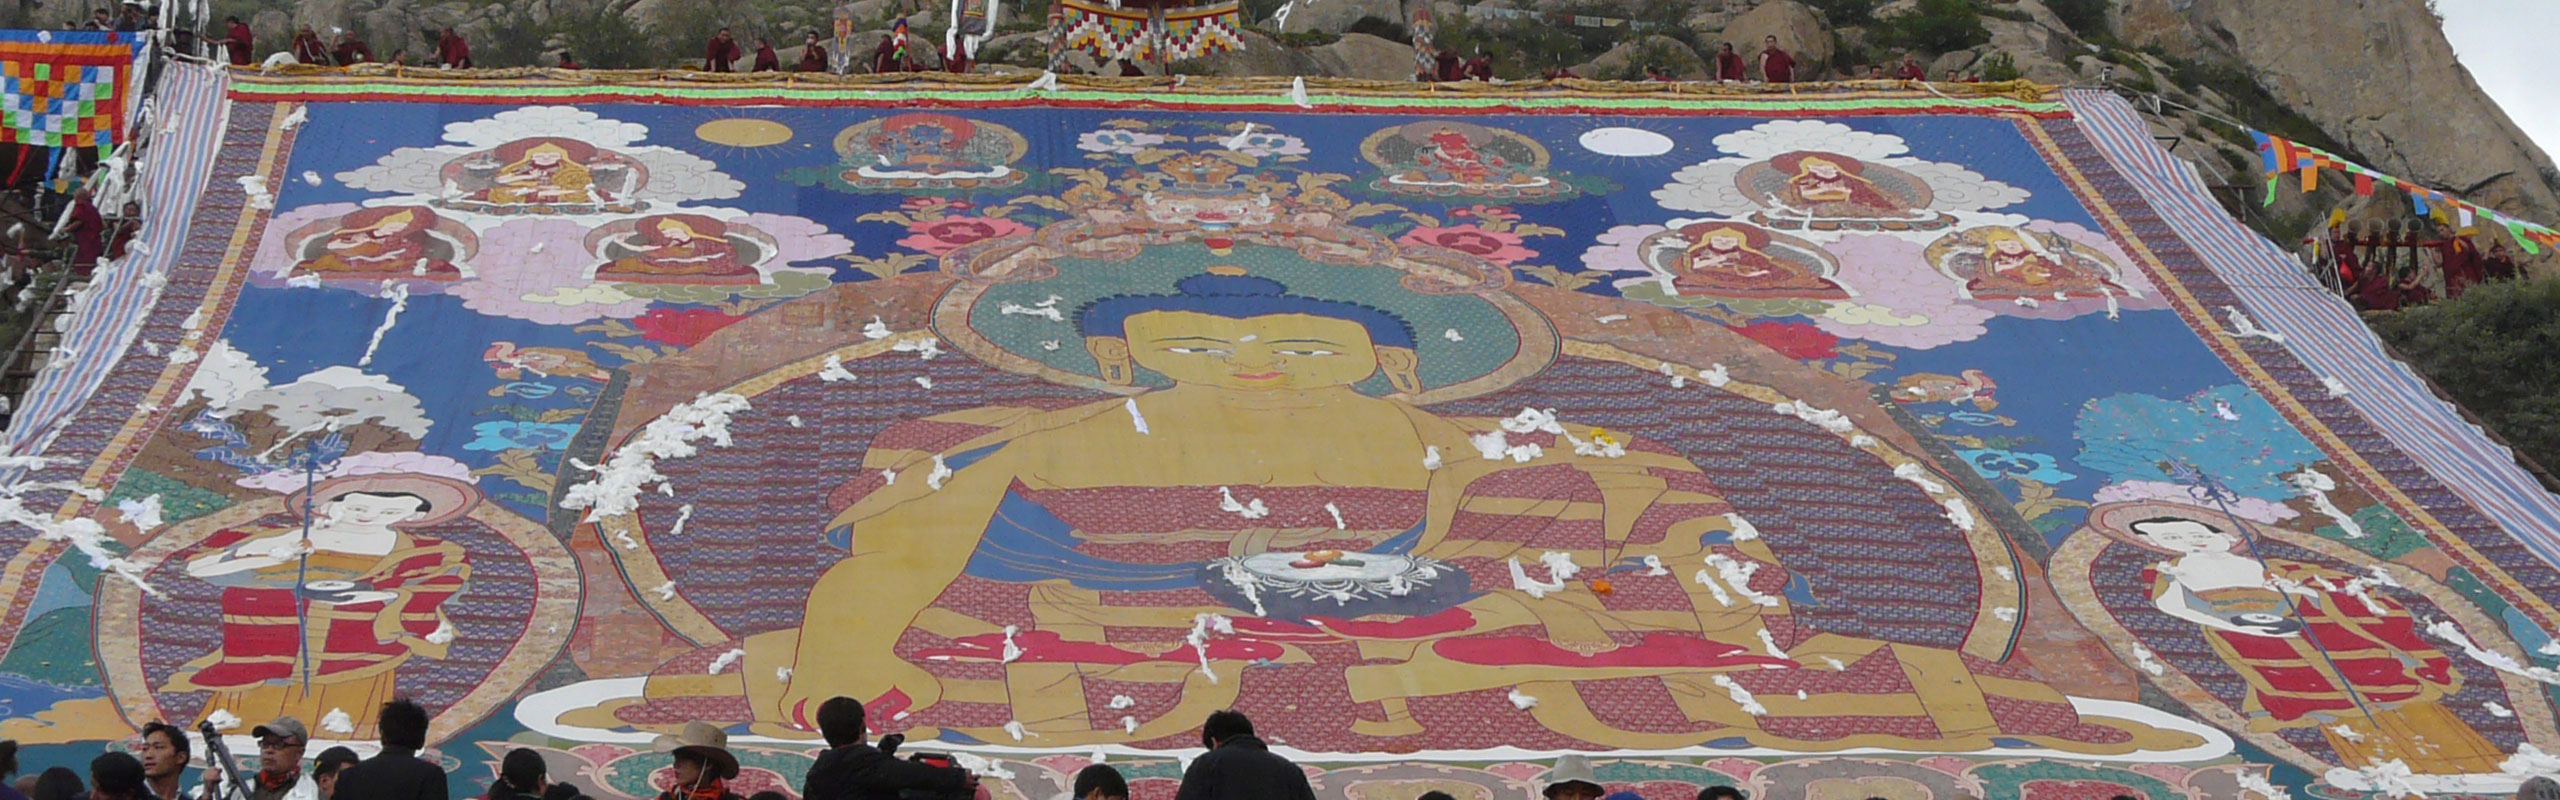 5-Day Tibet Shoton Festival Group Tour